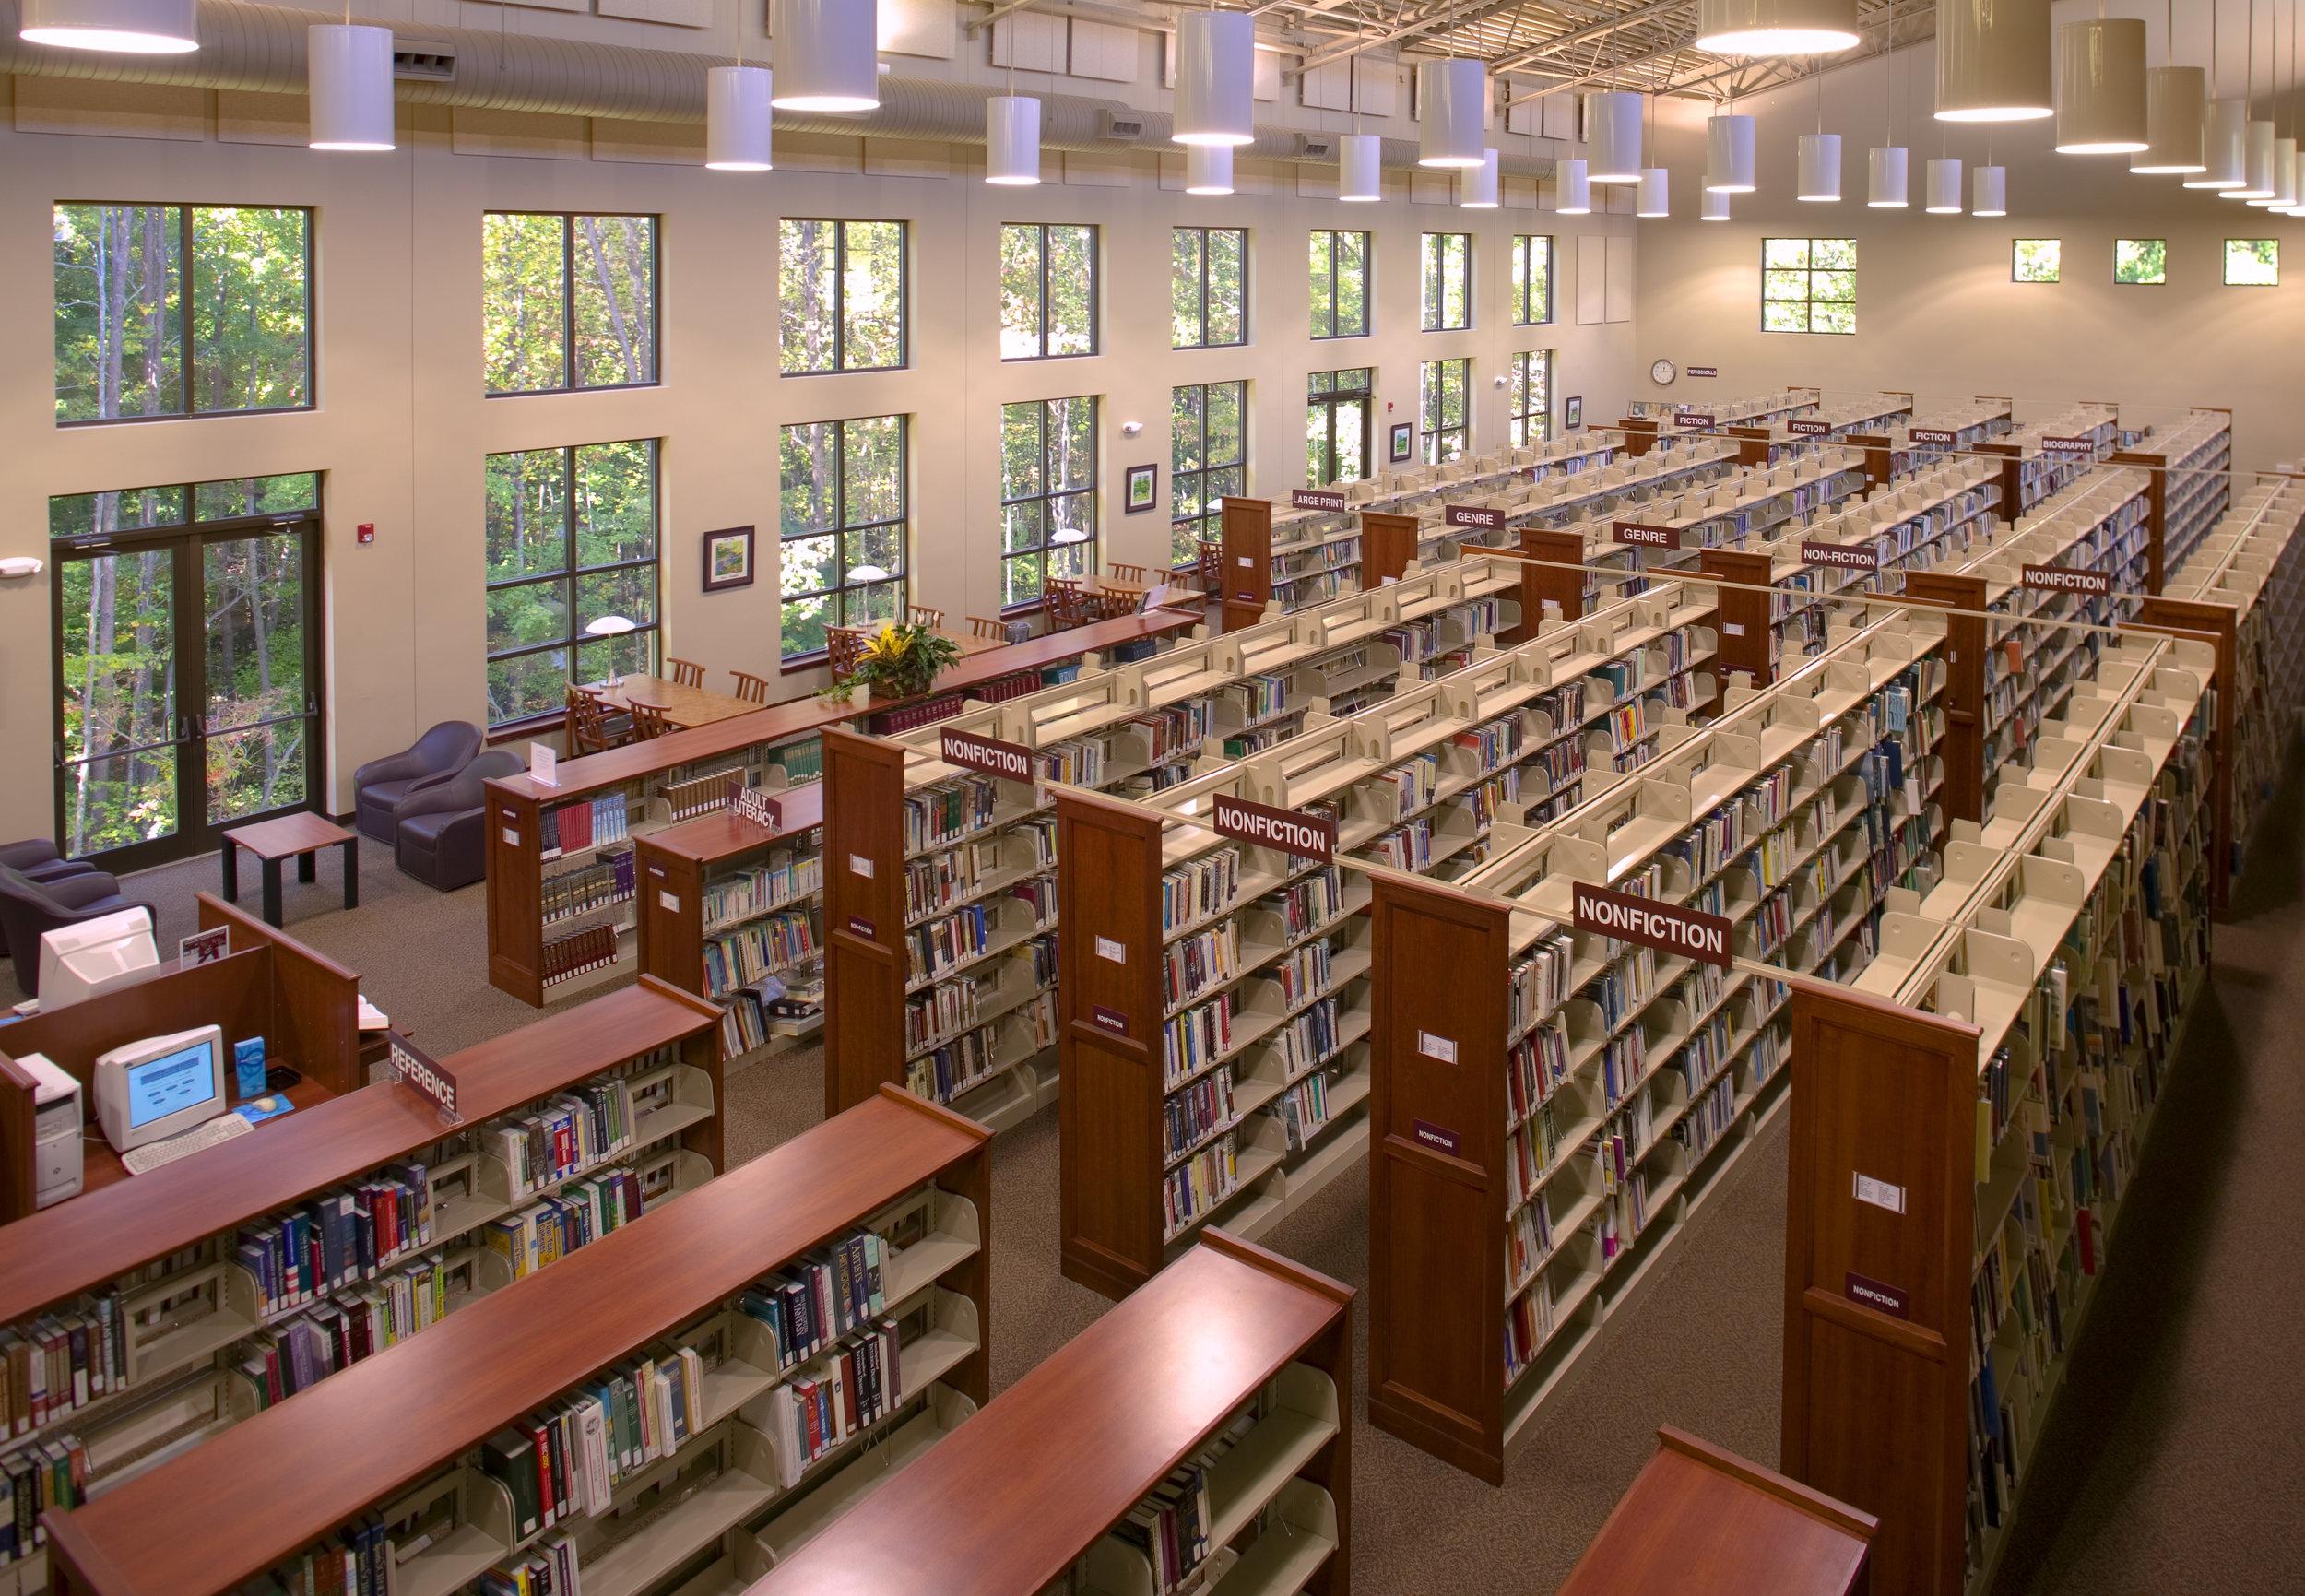 ADW-Civic-Library-Polk-County-Columbus-NC-Interior-1.jpg